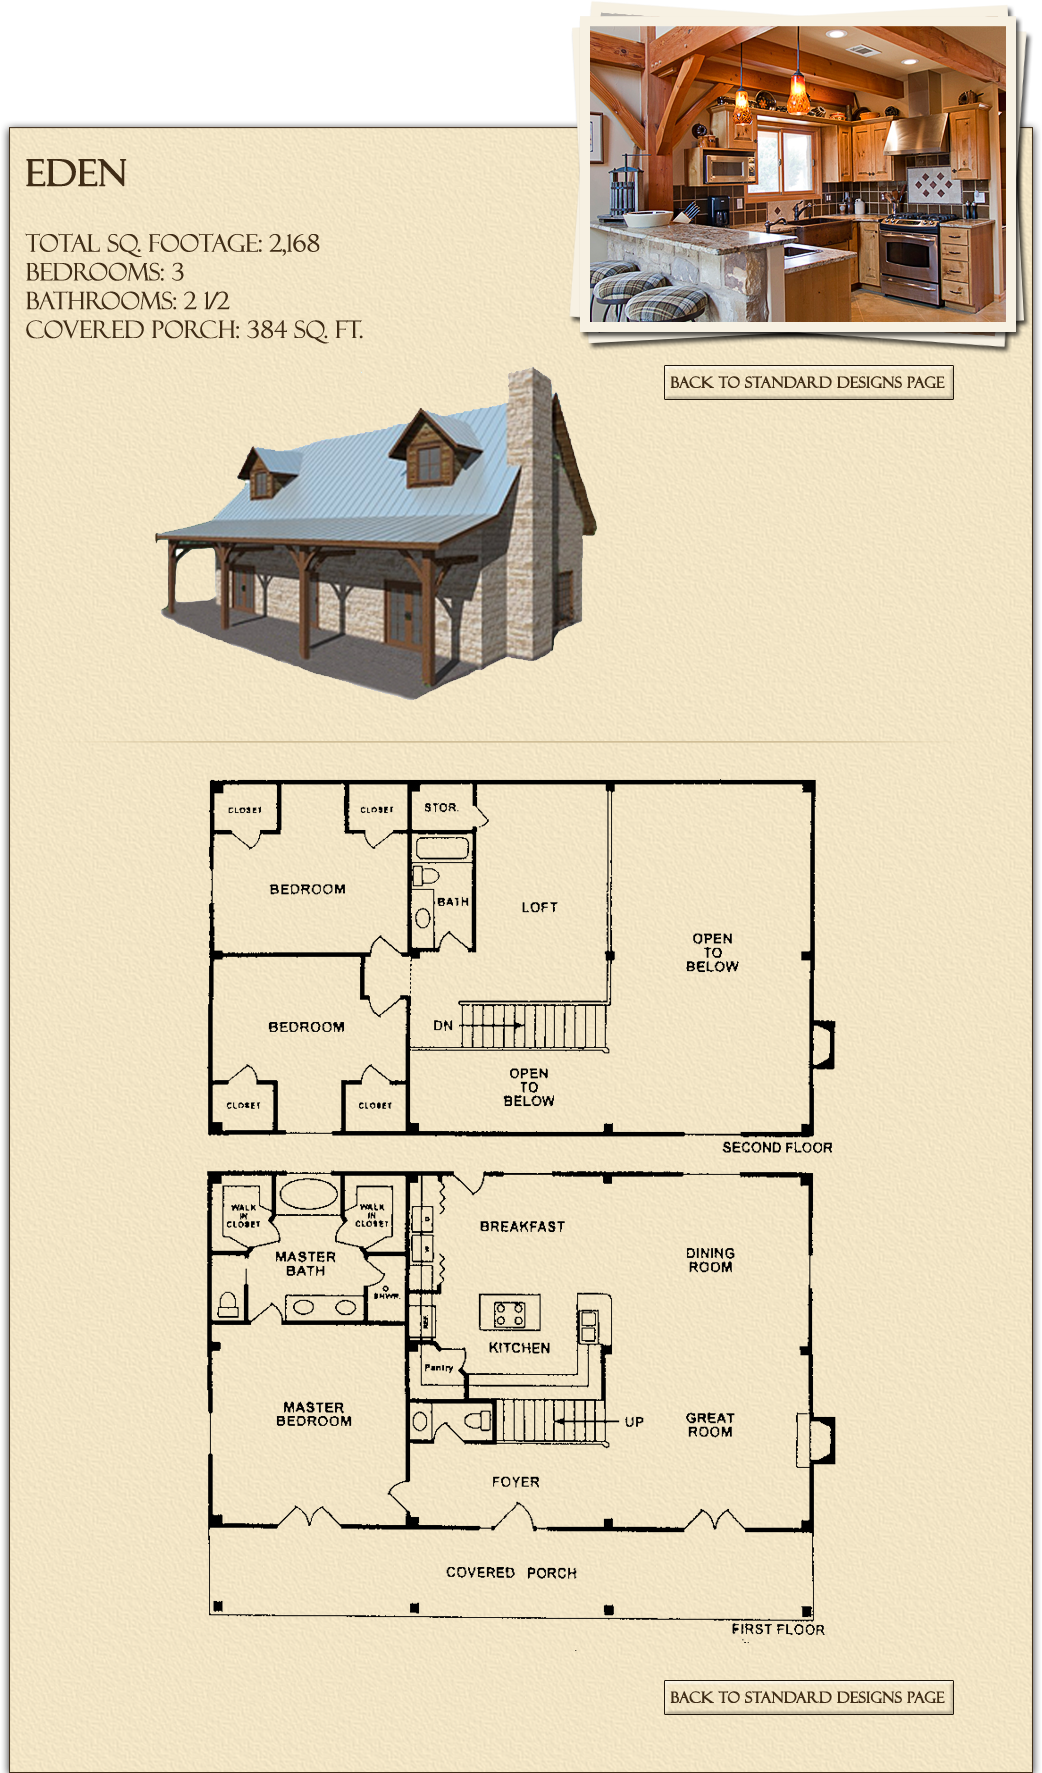 Pin By Luke Wright On Barns Homes And Barn Home Ideas Barn House Plans Log Home Plans Pole Barn Homes